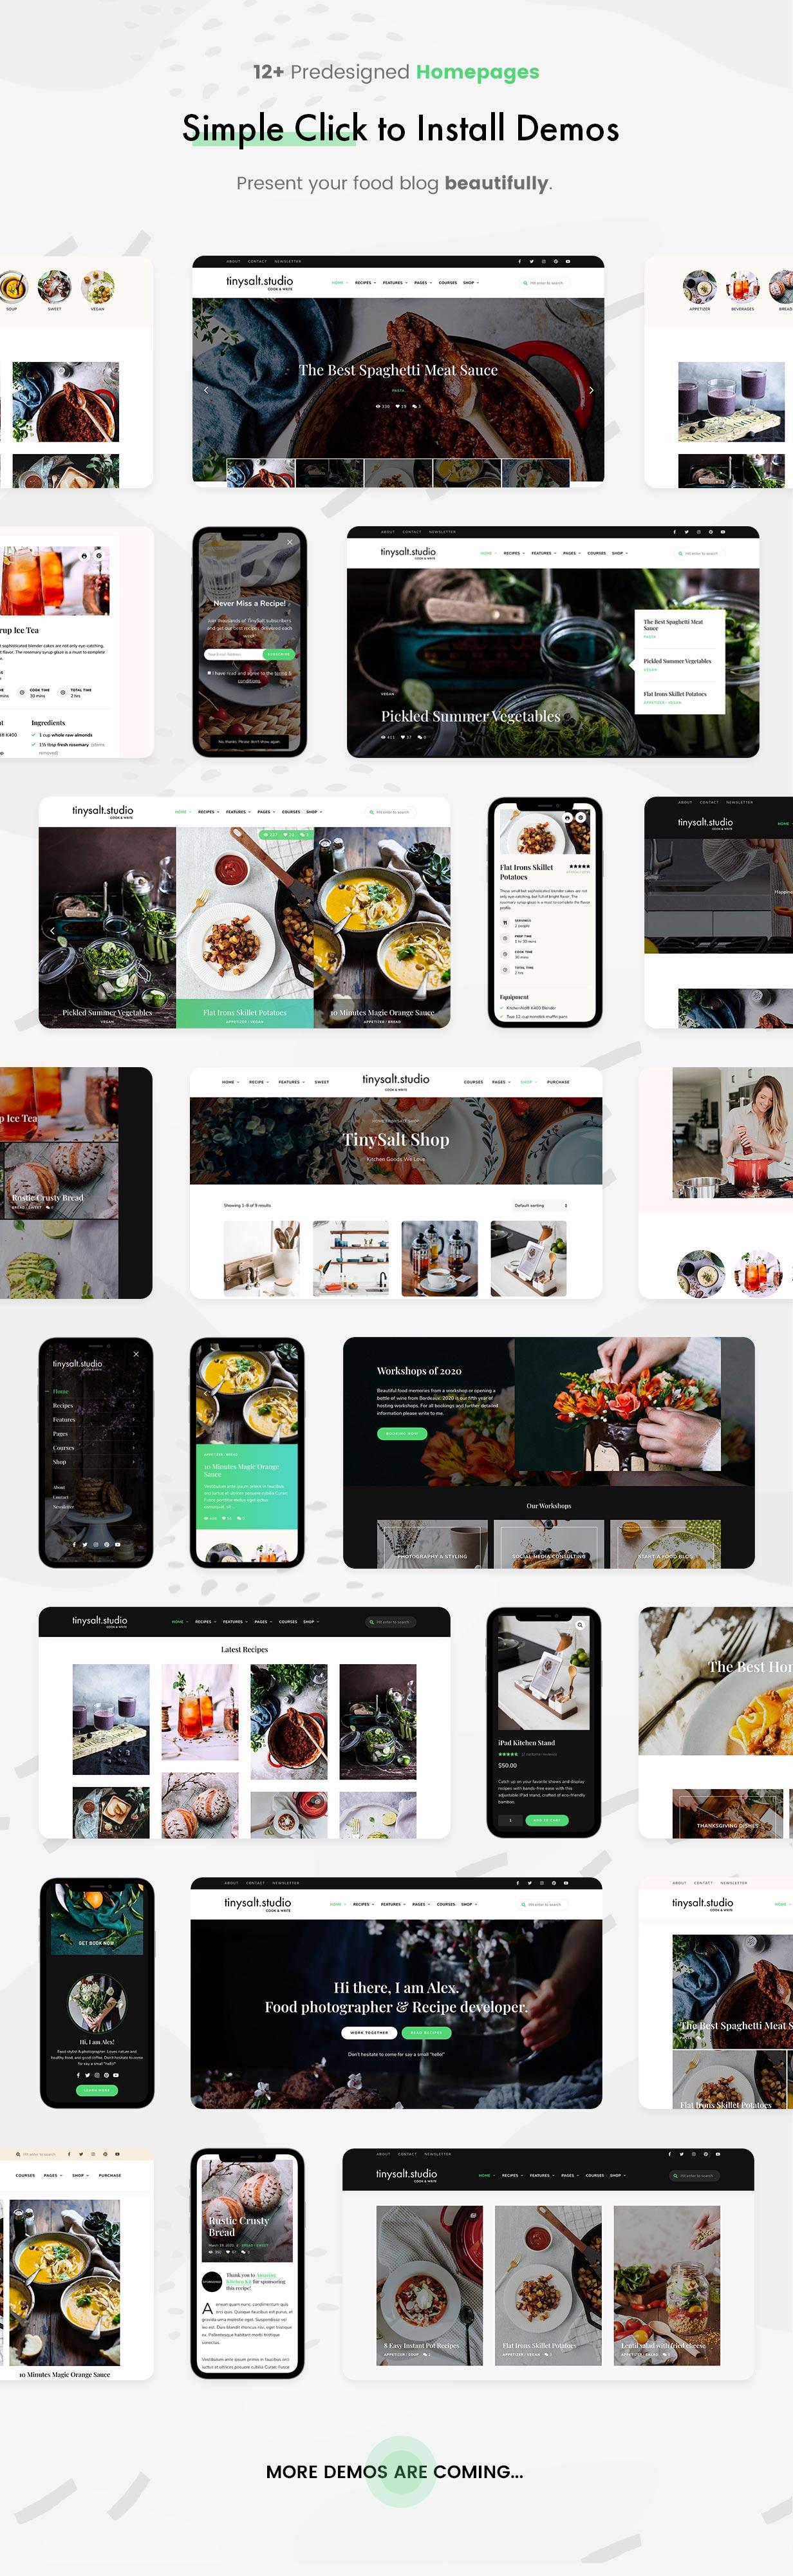 TinySalt - 12+ Homepages.